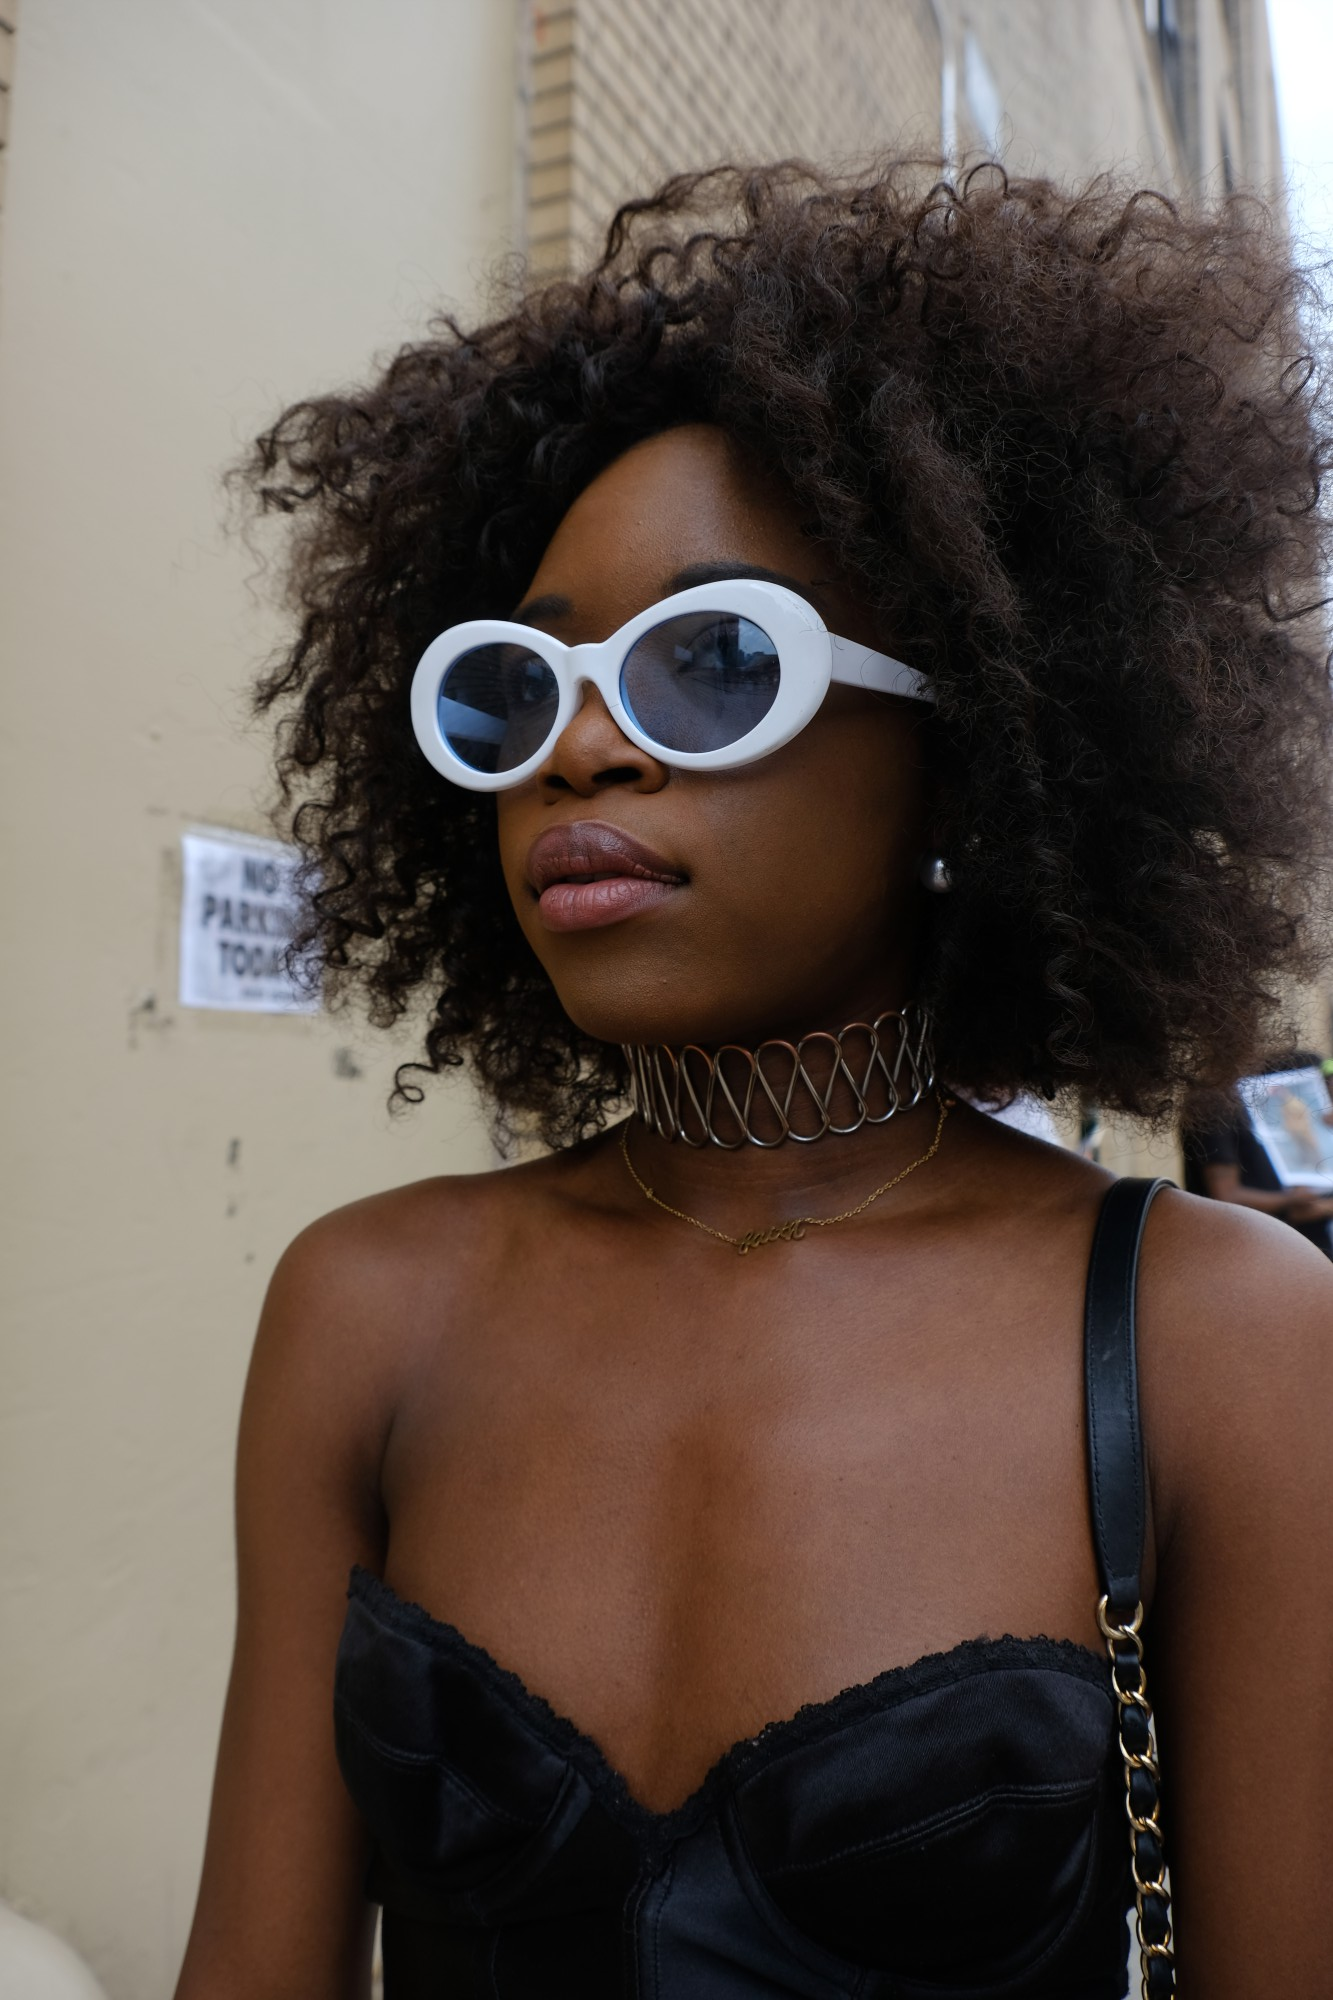 African American fashionista in sunglasses